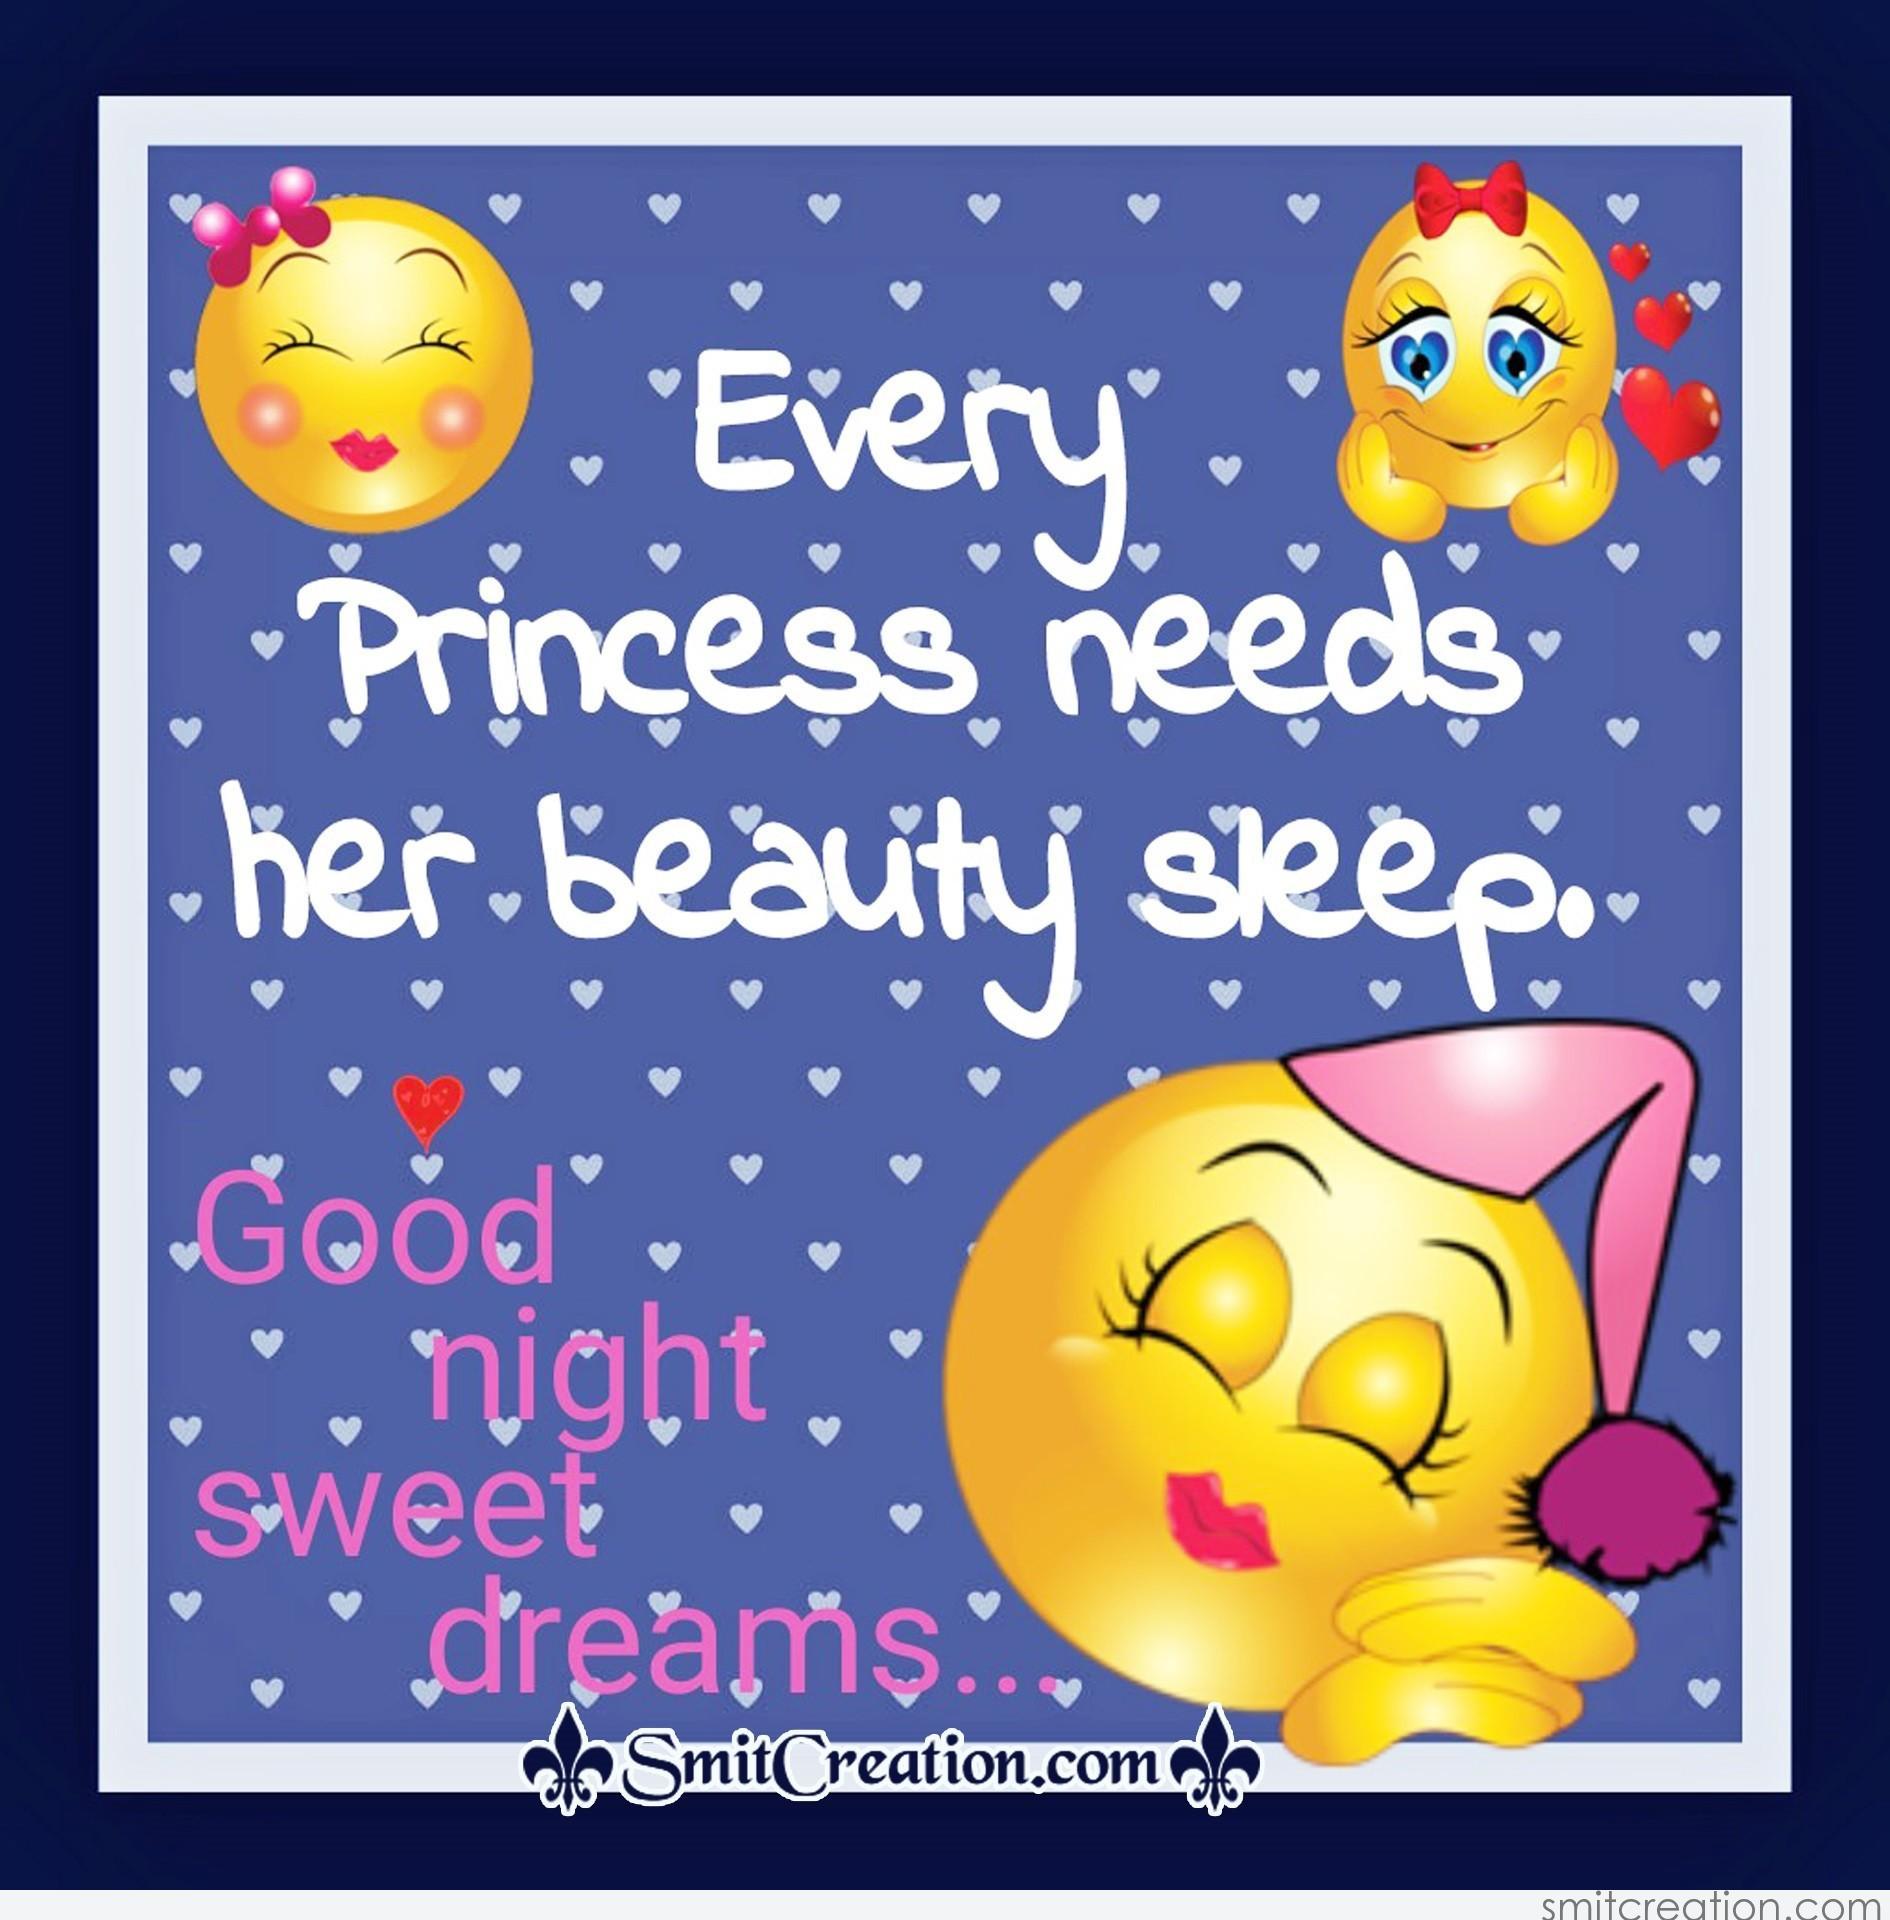 Good Night Sweet Dreams 🙂